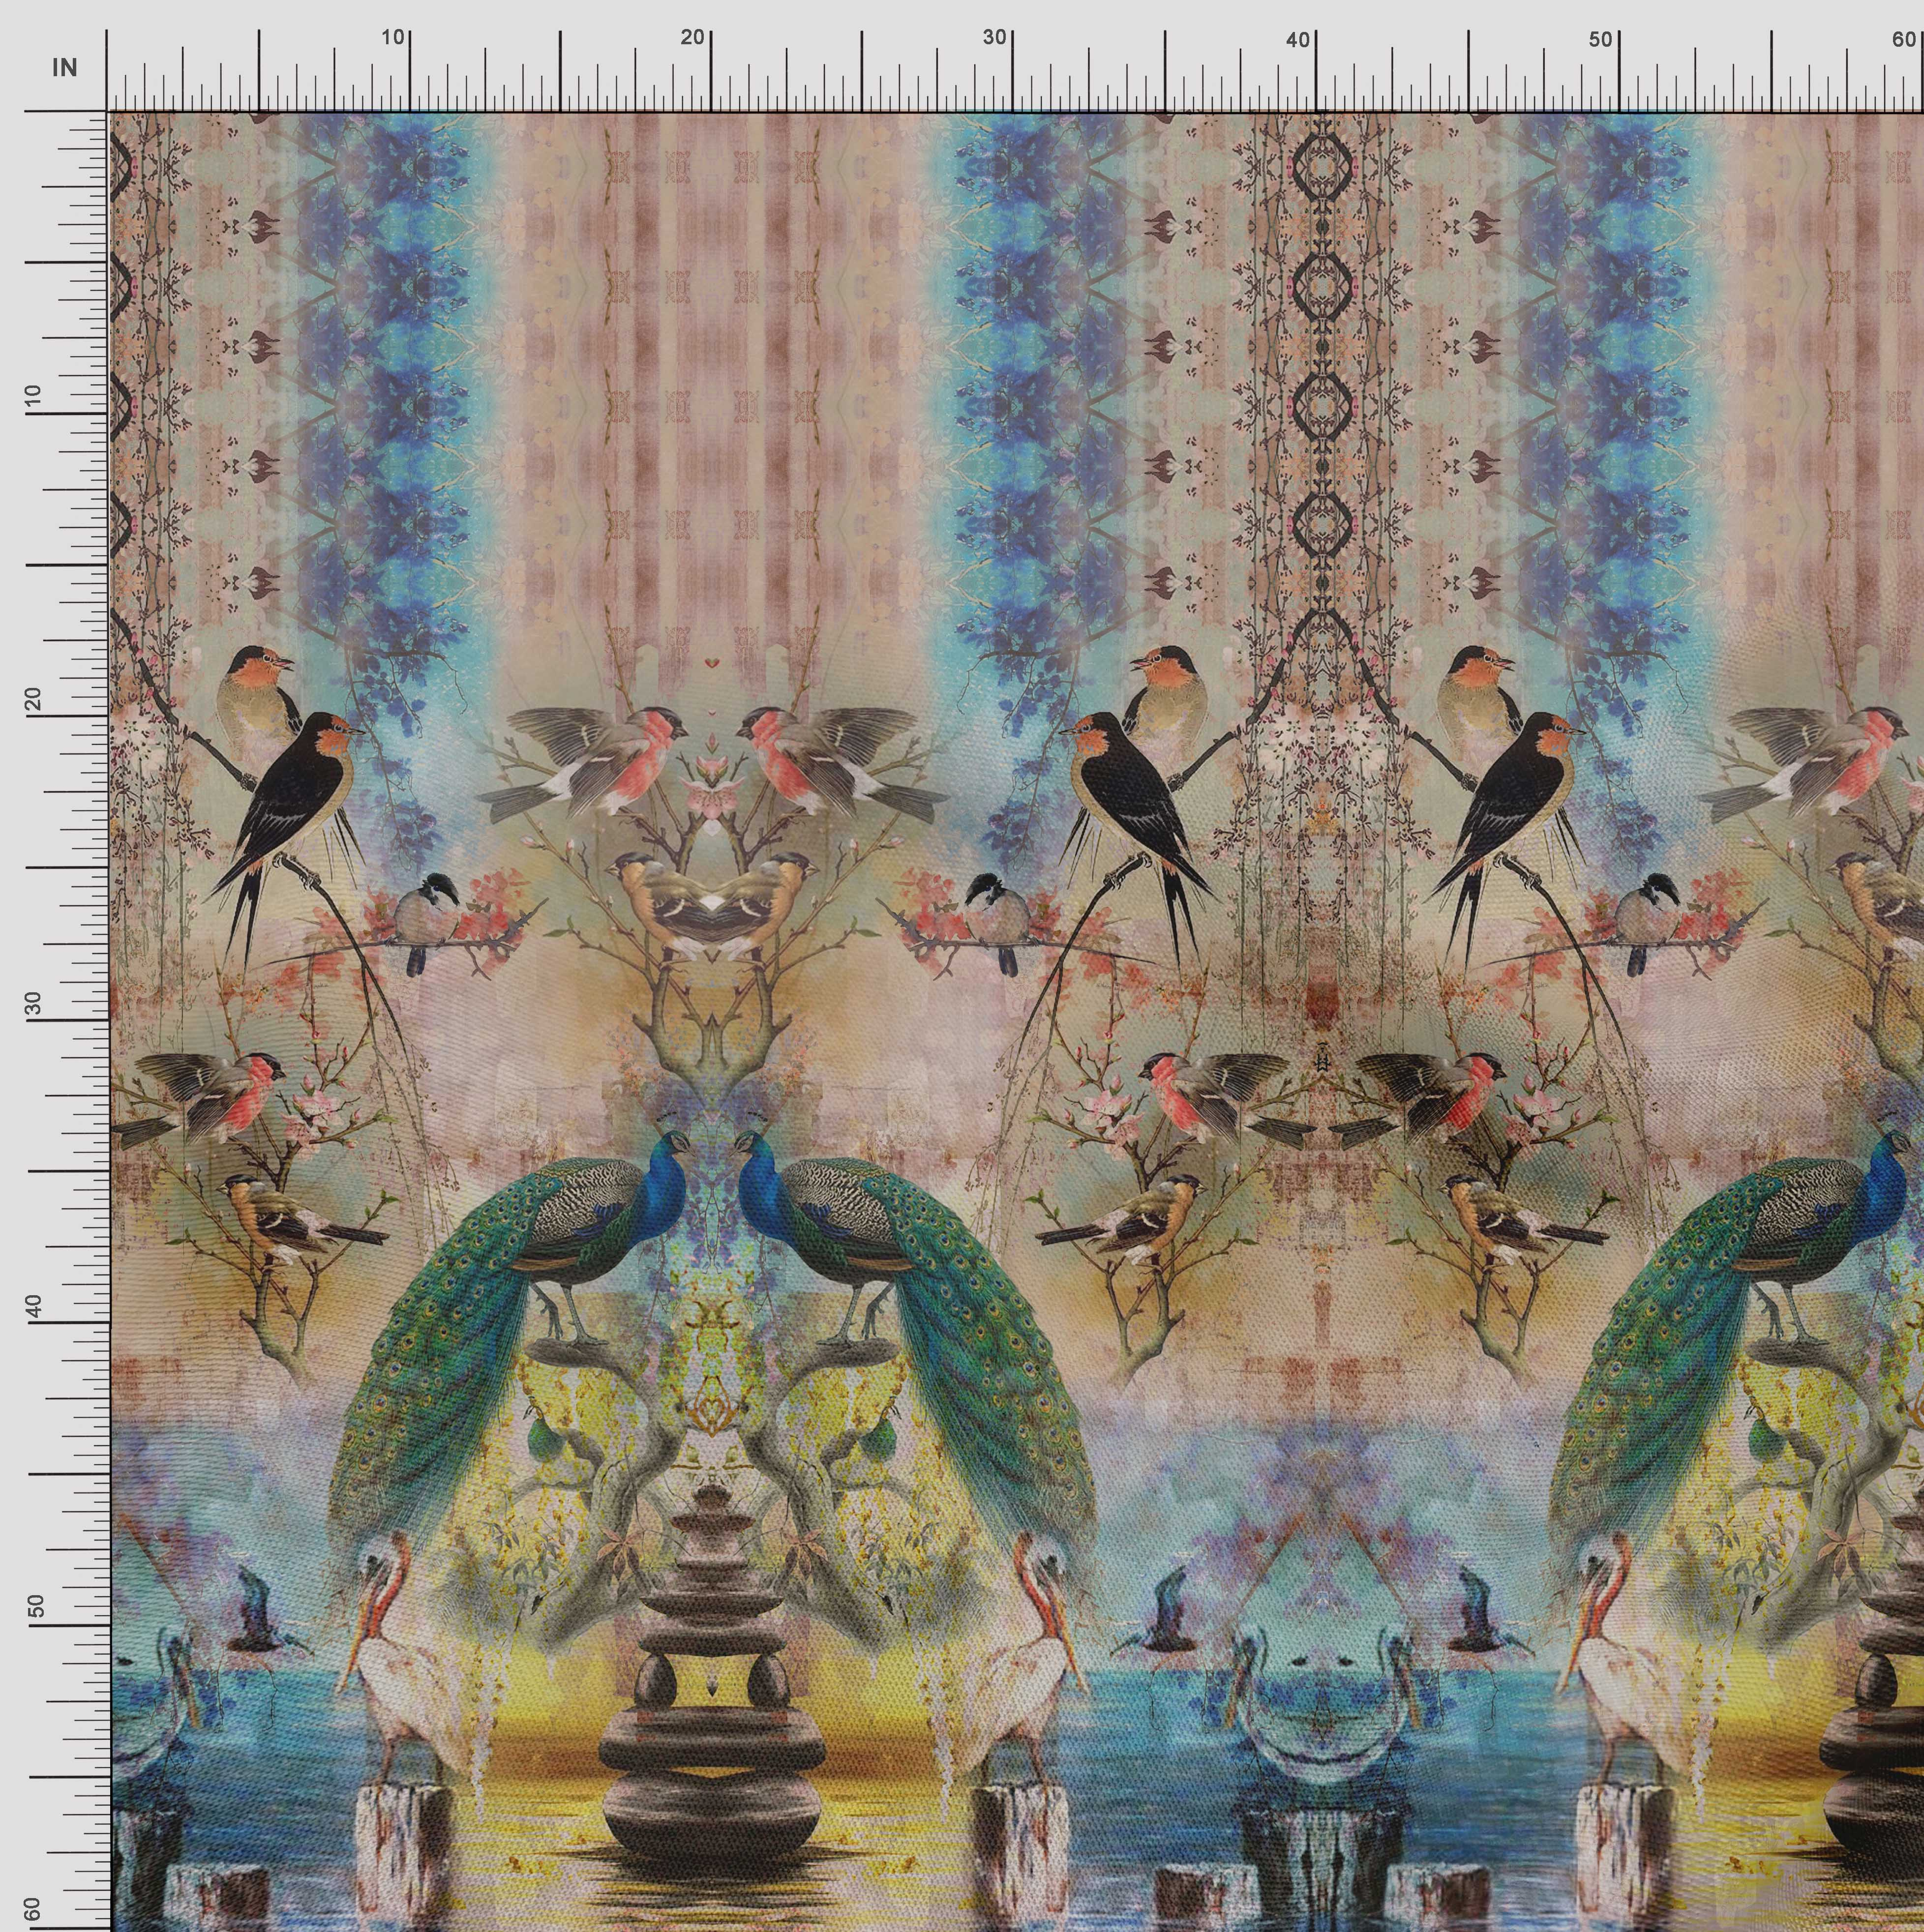 Soimoi-Cotton-Poplin-Fabric-Peacock-Panel-Print-Fabric-by-metre-rib thumbnail 4